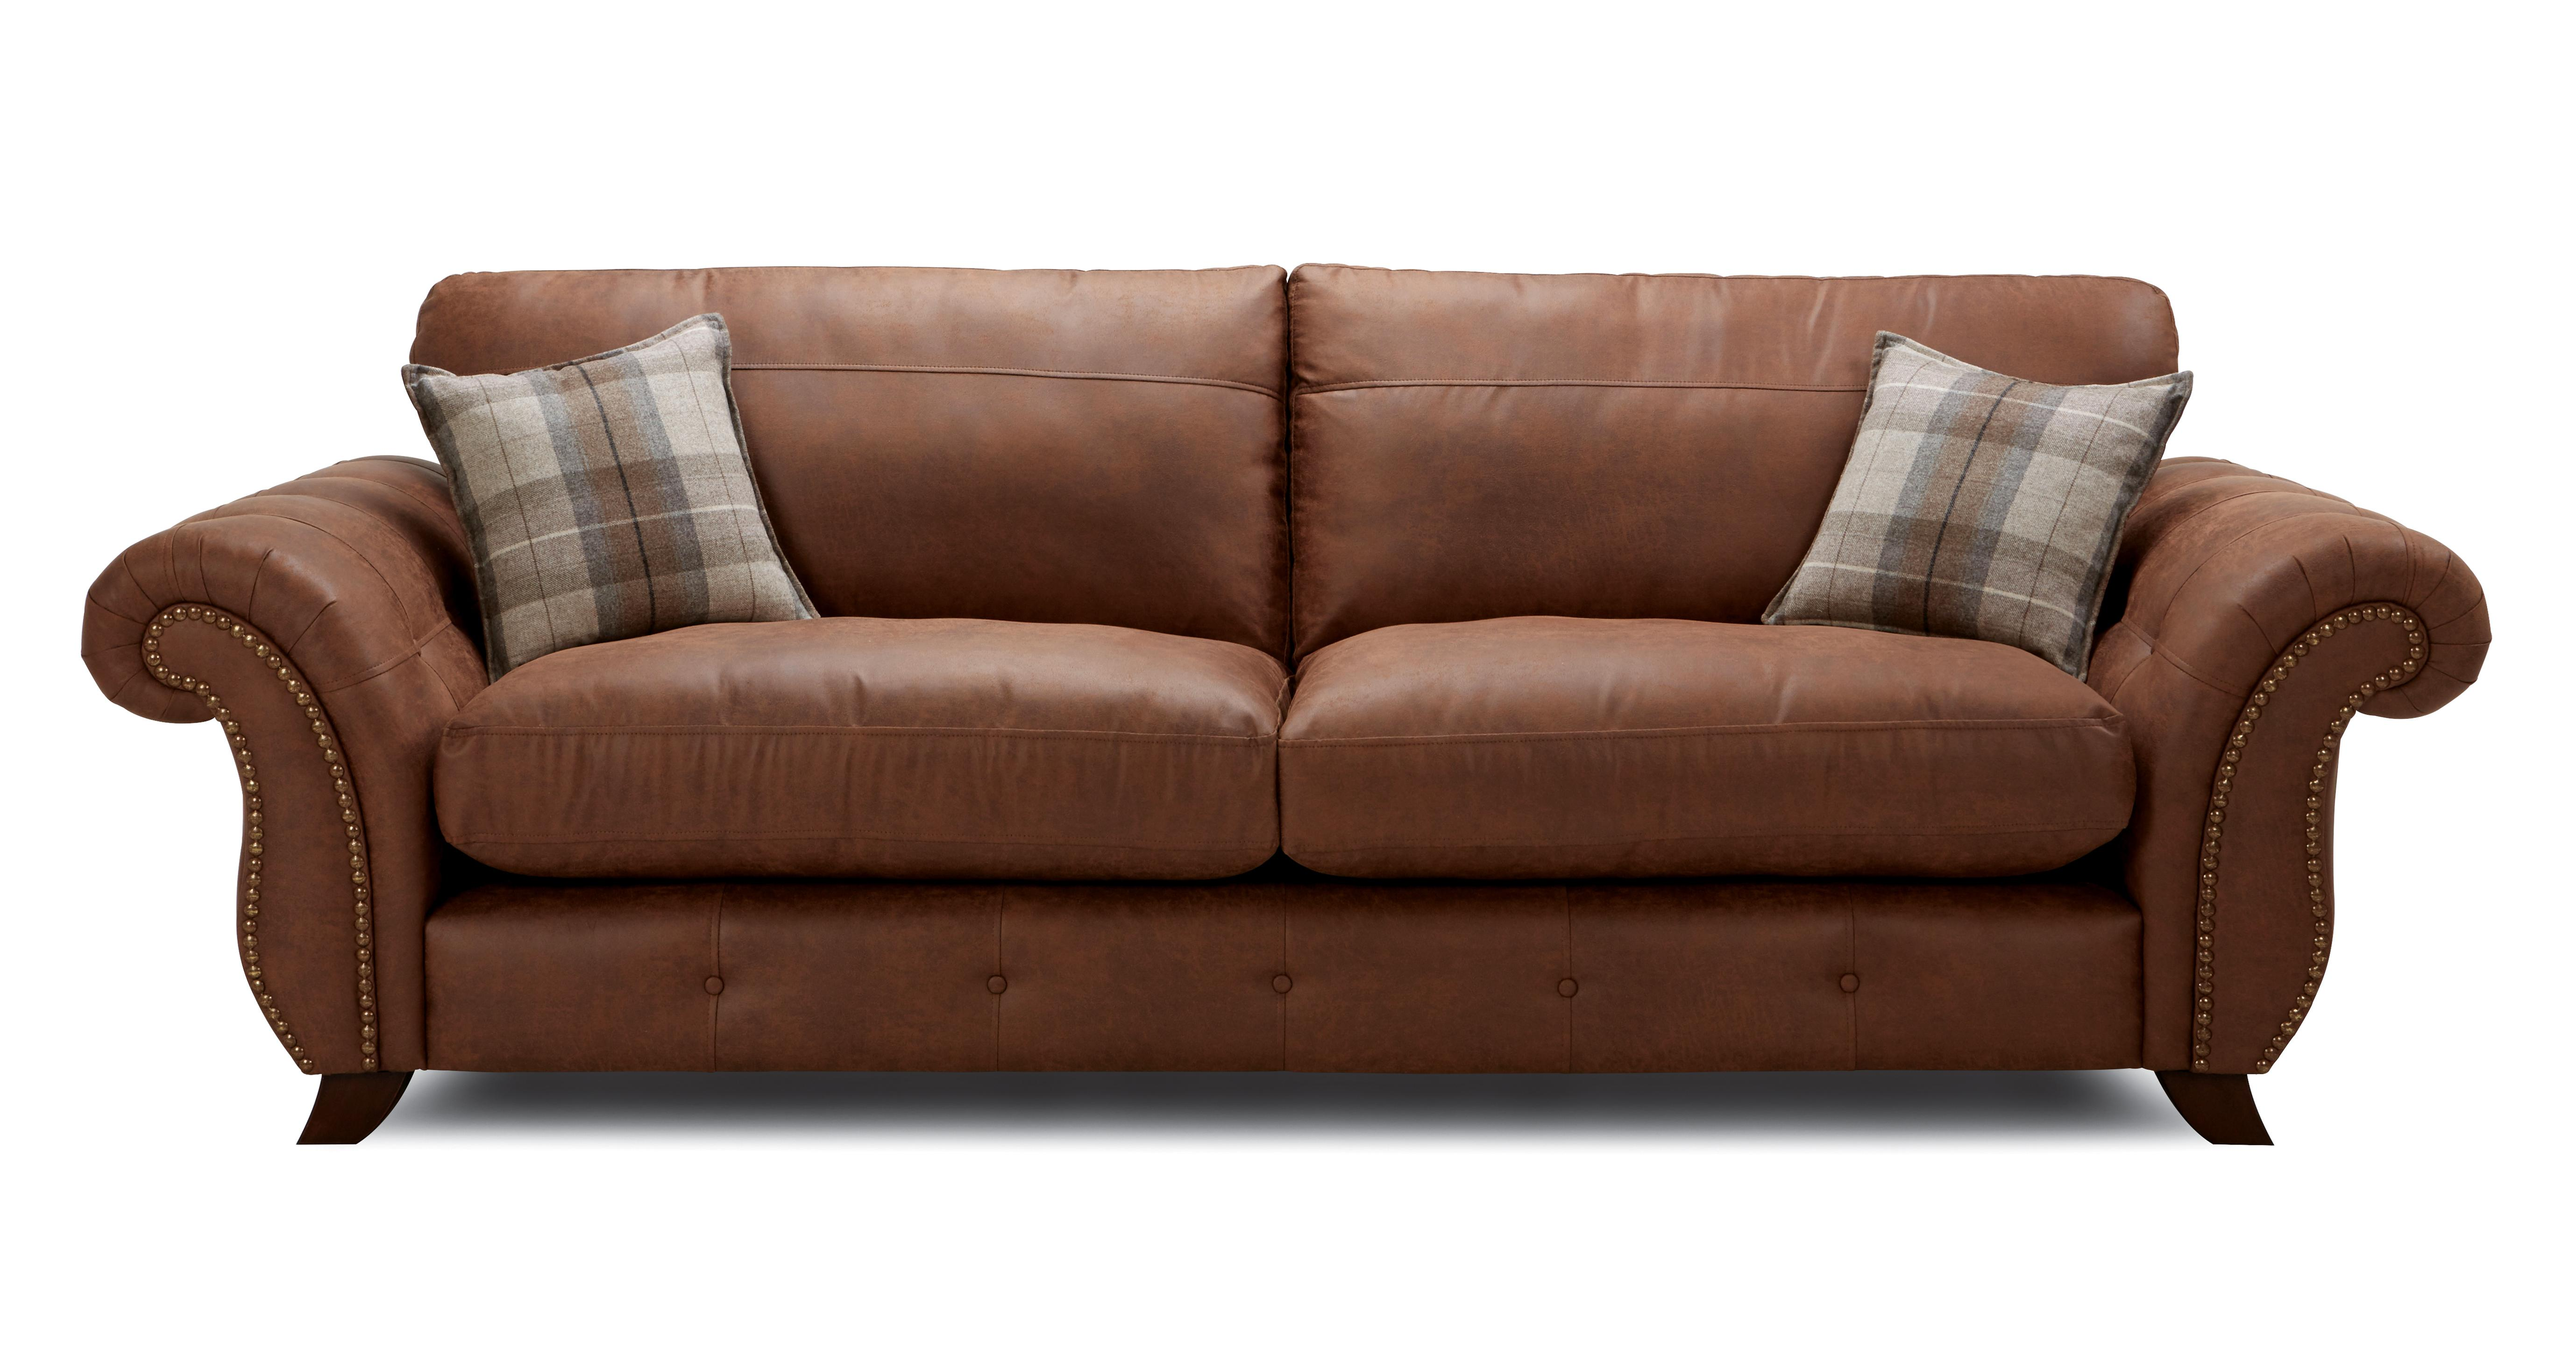 vine dfs sofa review century foam oakland gradschoolfairs